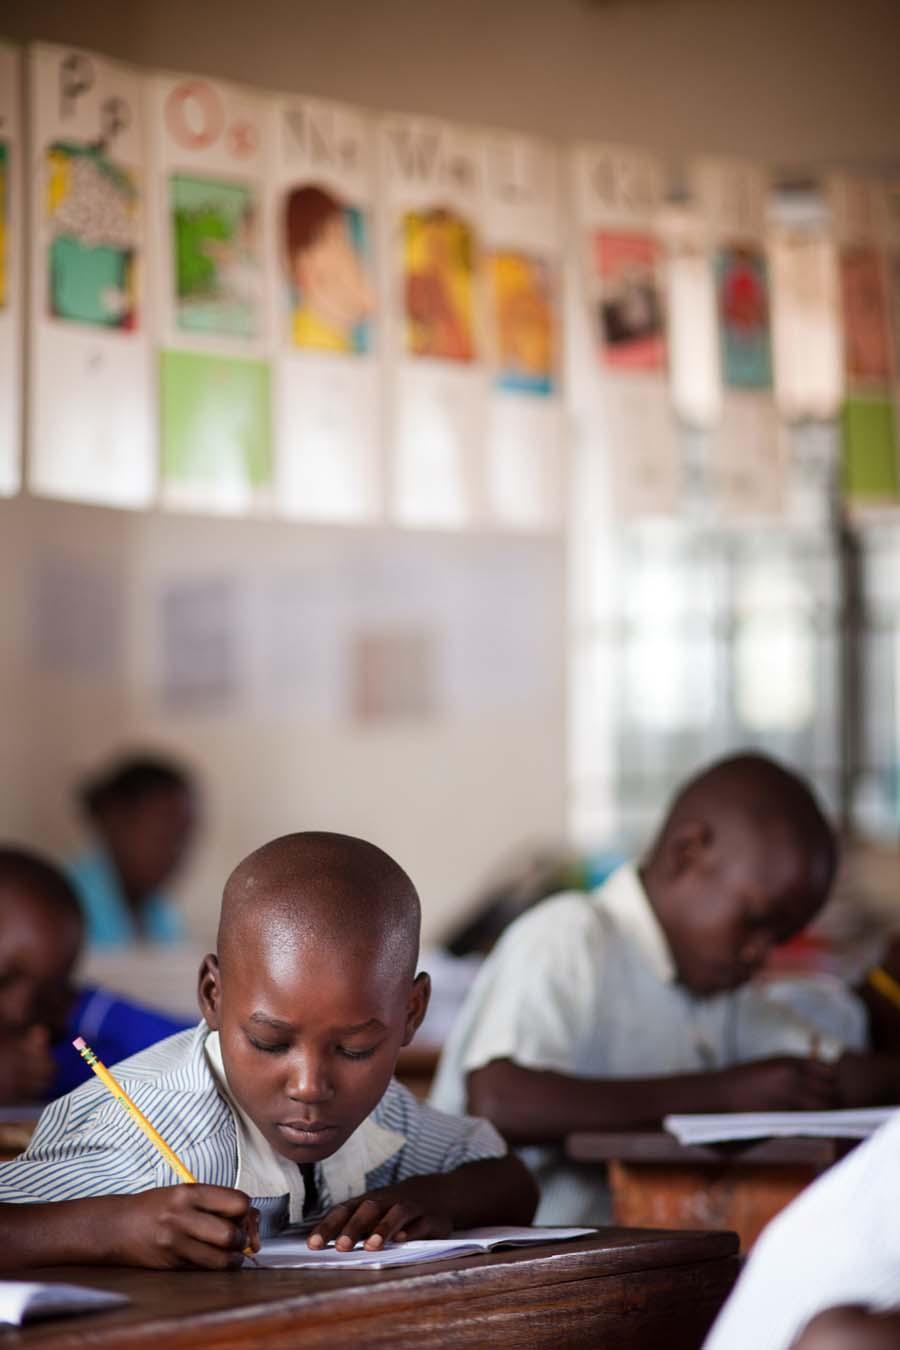 jessicadavisphotography.com | Jessica Davis Photography | Portrait Work in Uganda| Travel Photographer | World Event Photographs 1 (8).jpg